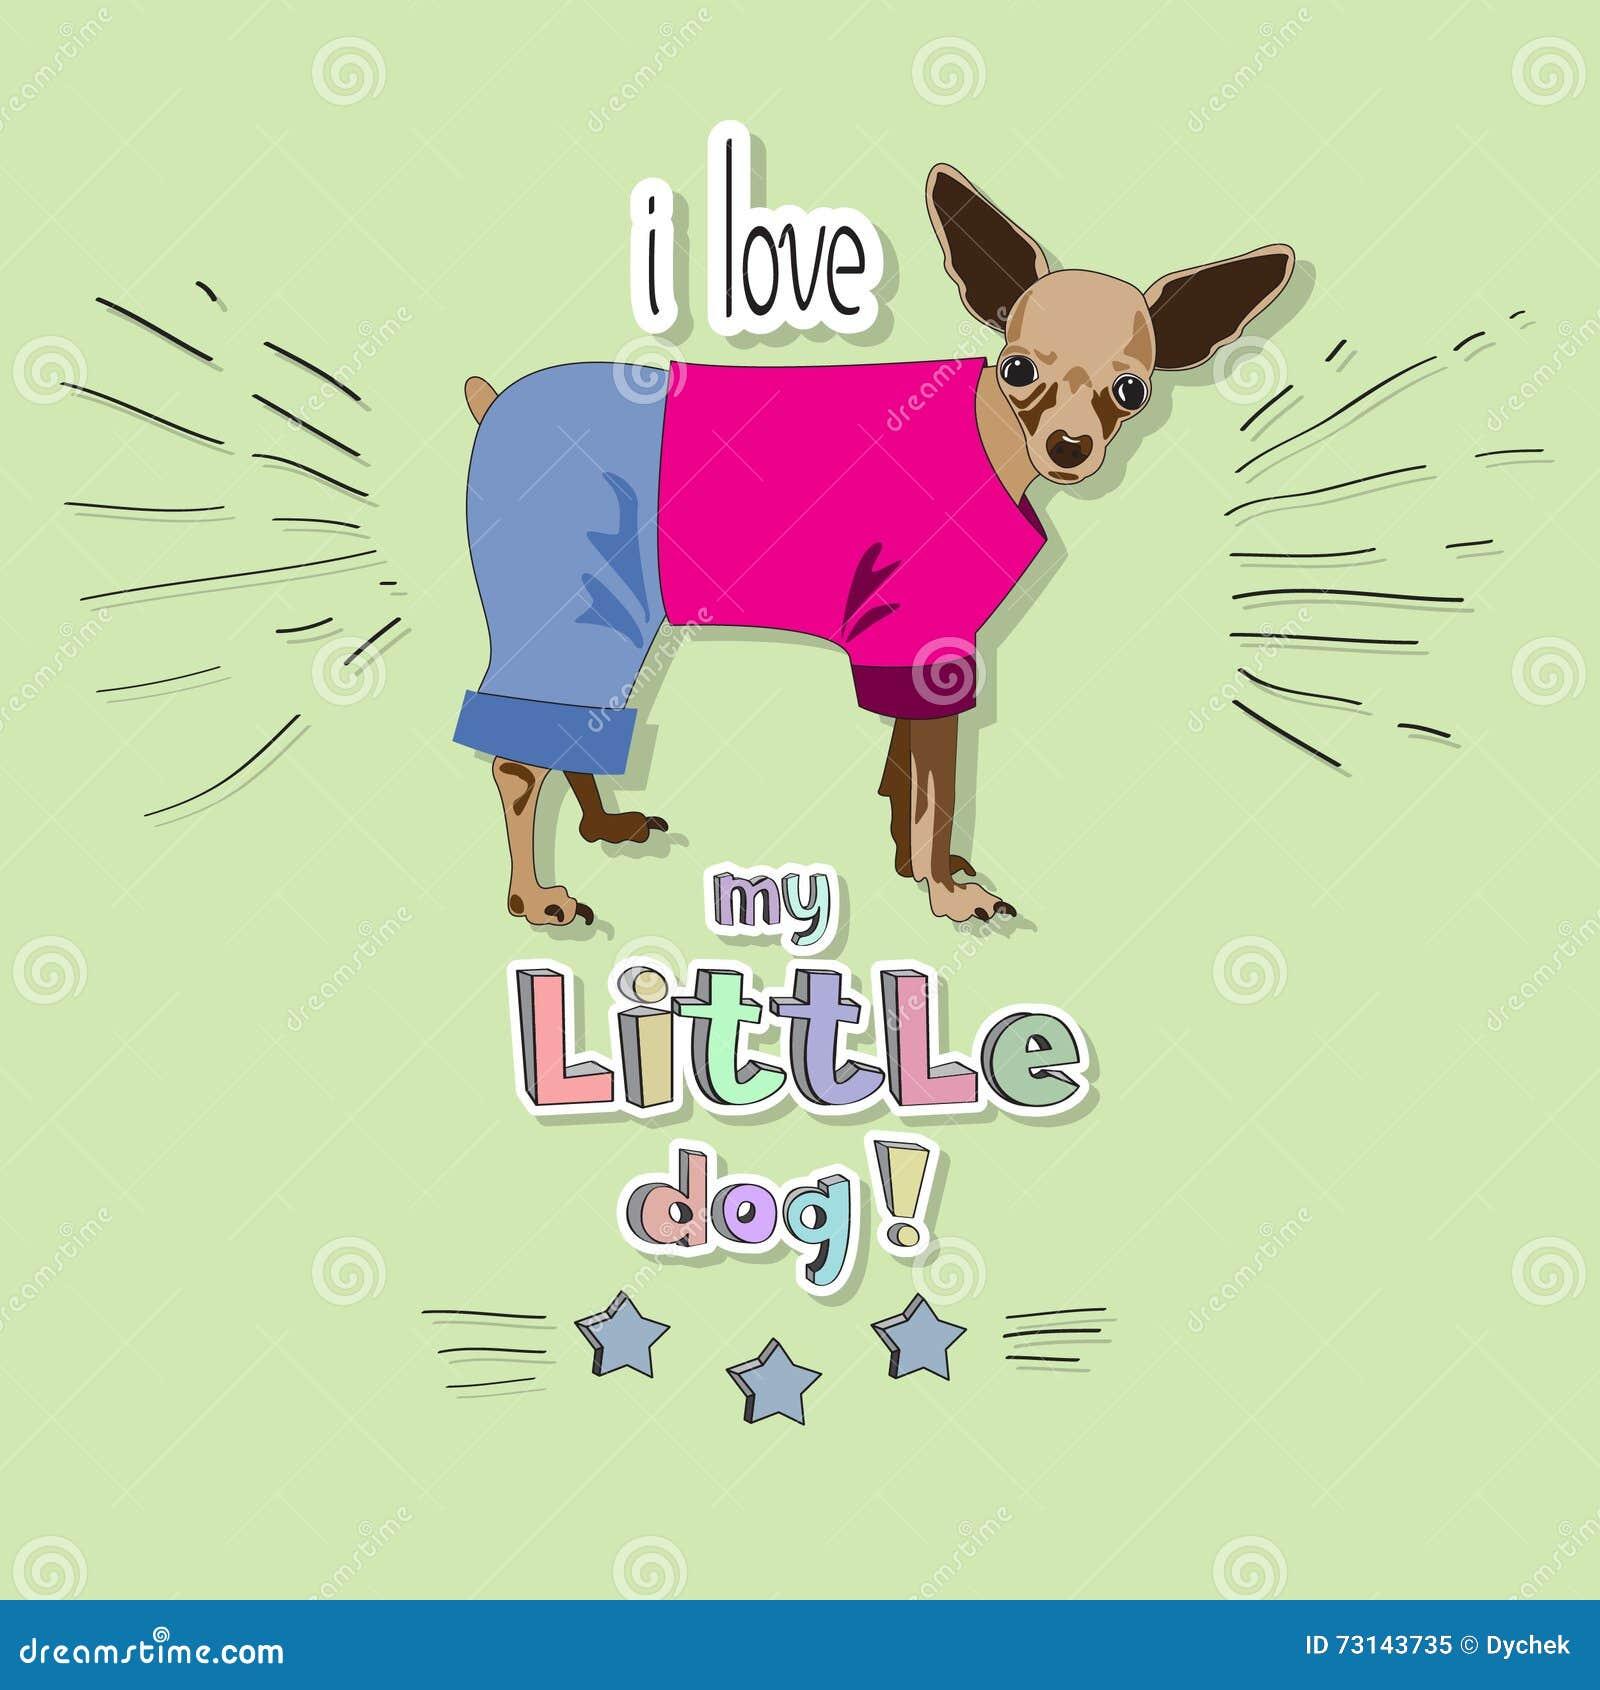 Download I Love My Little Dog Stock Vector Illustration Of Phrase